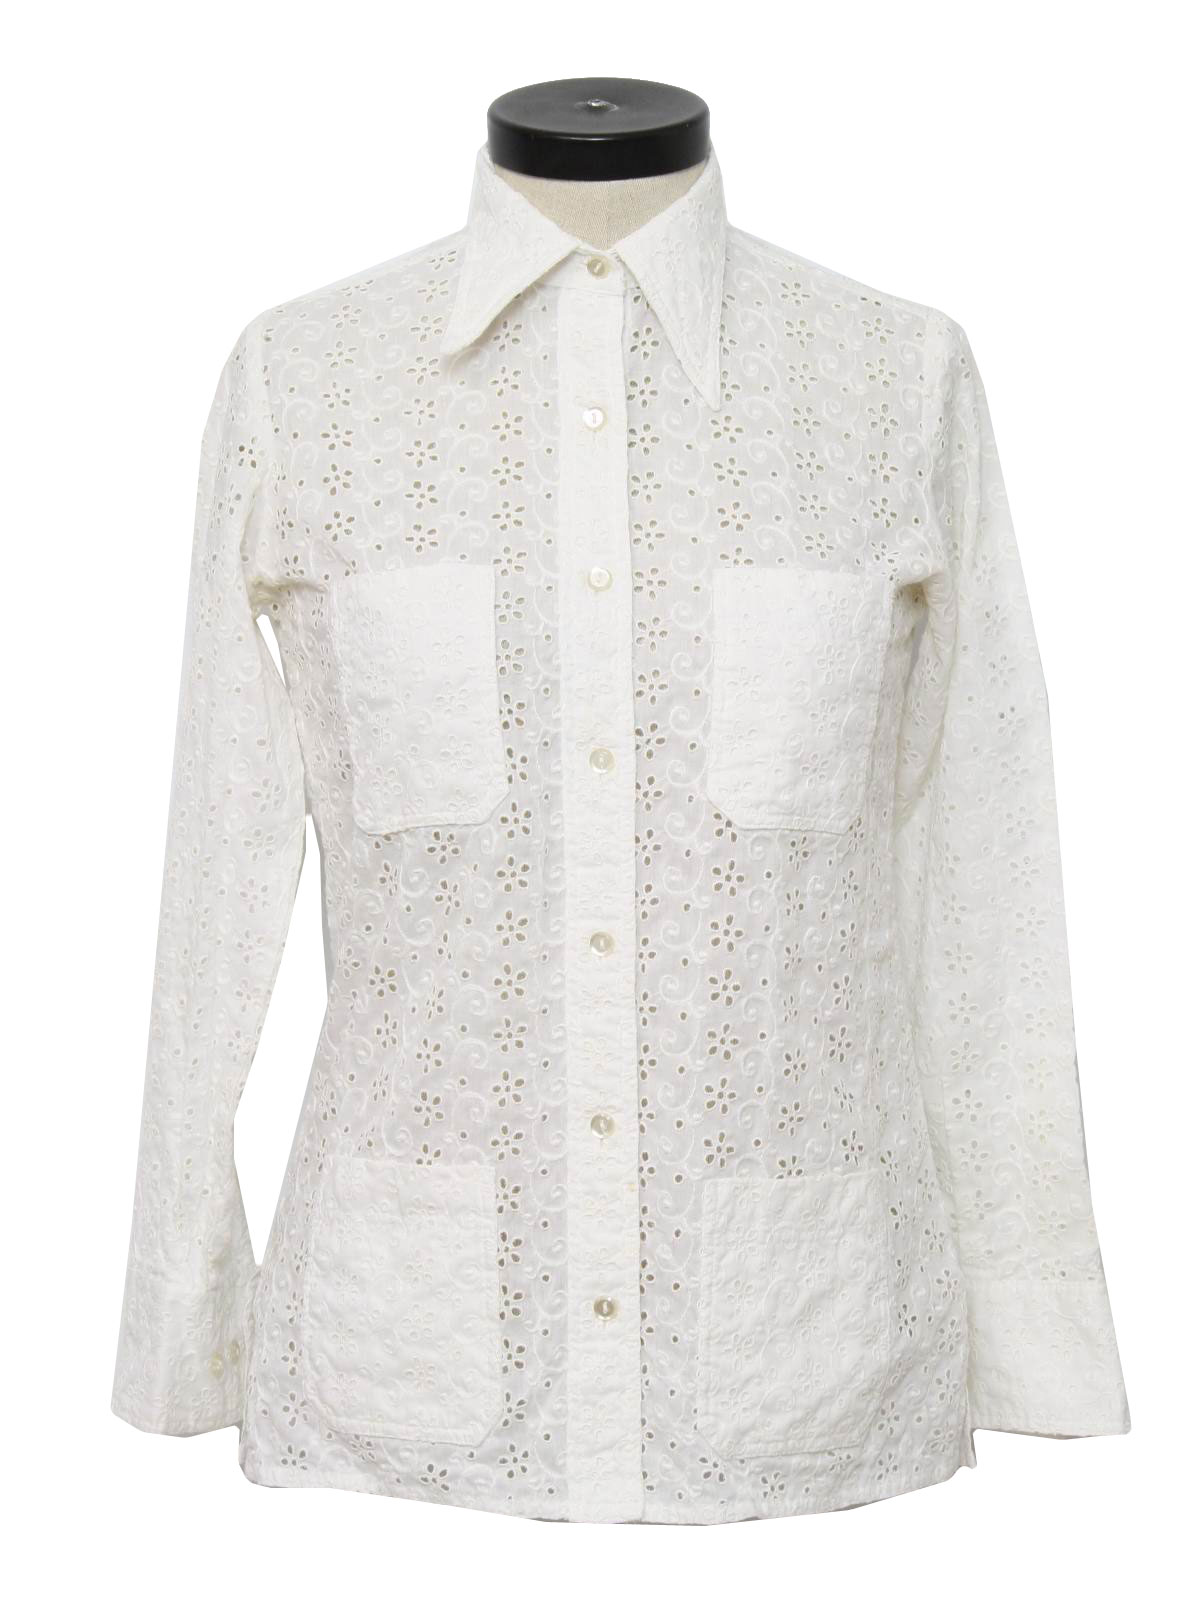 Retro 1970 39 s shirt neiman marcus 70s neiman marcus for Mens eyelet collar dress shirts